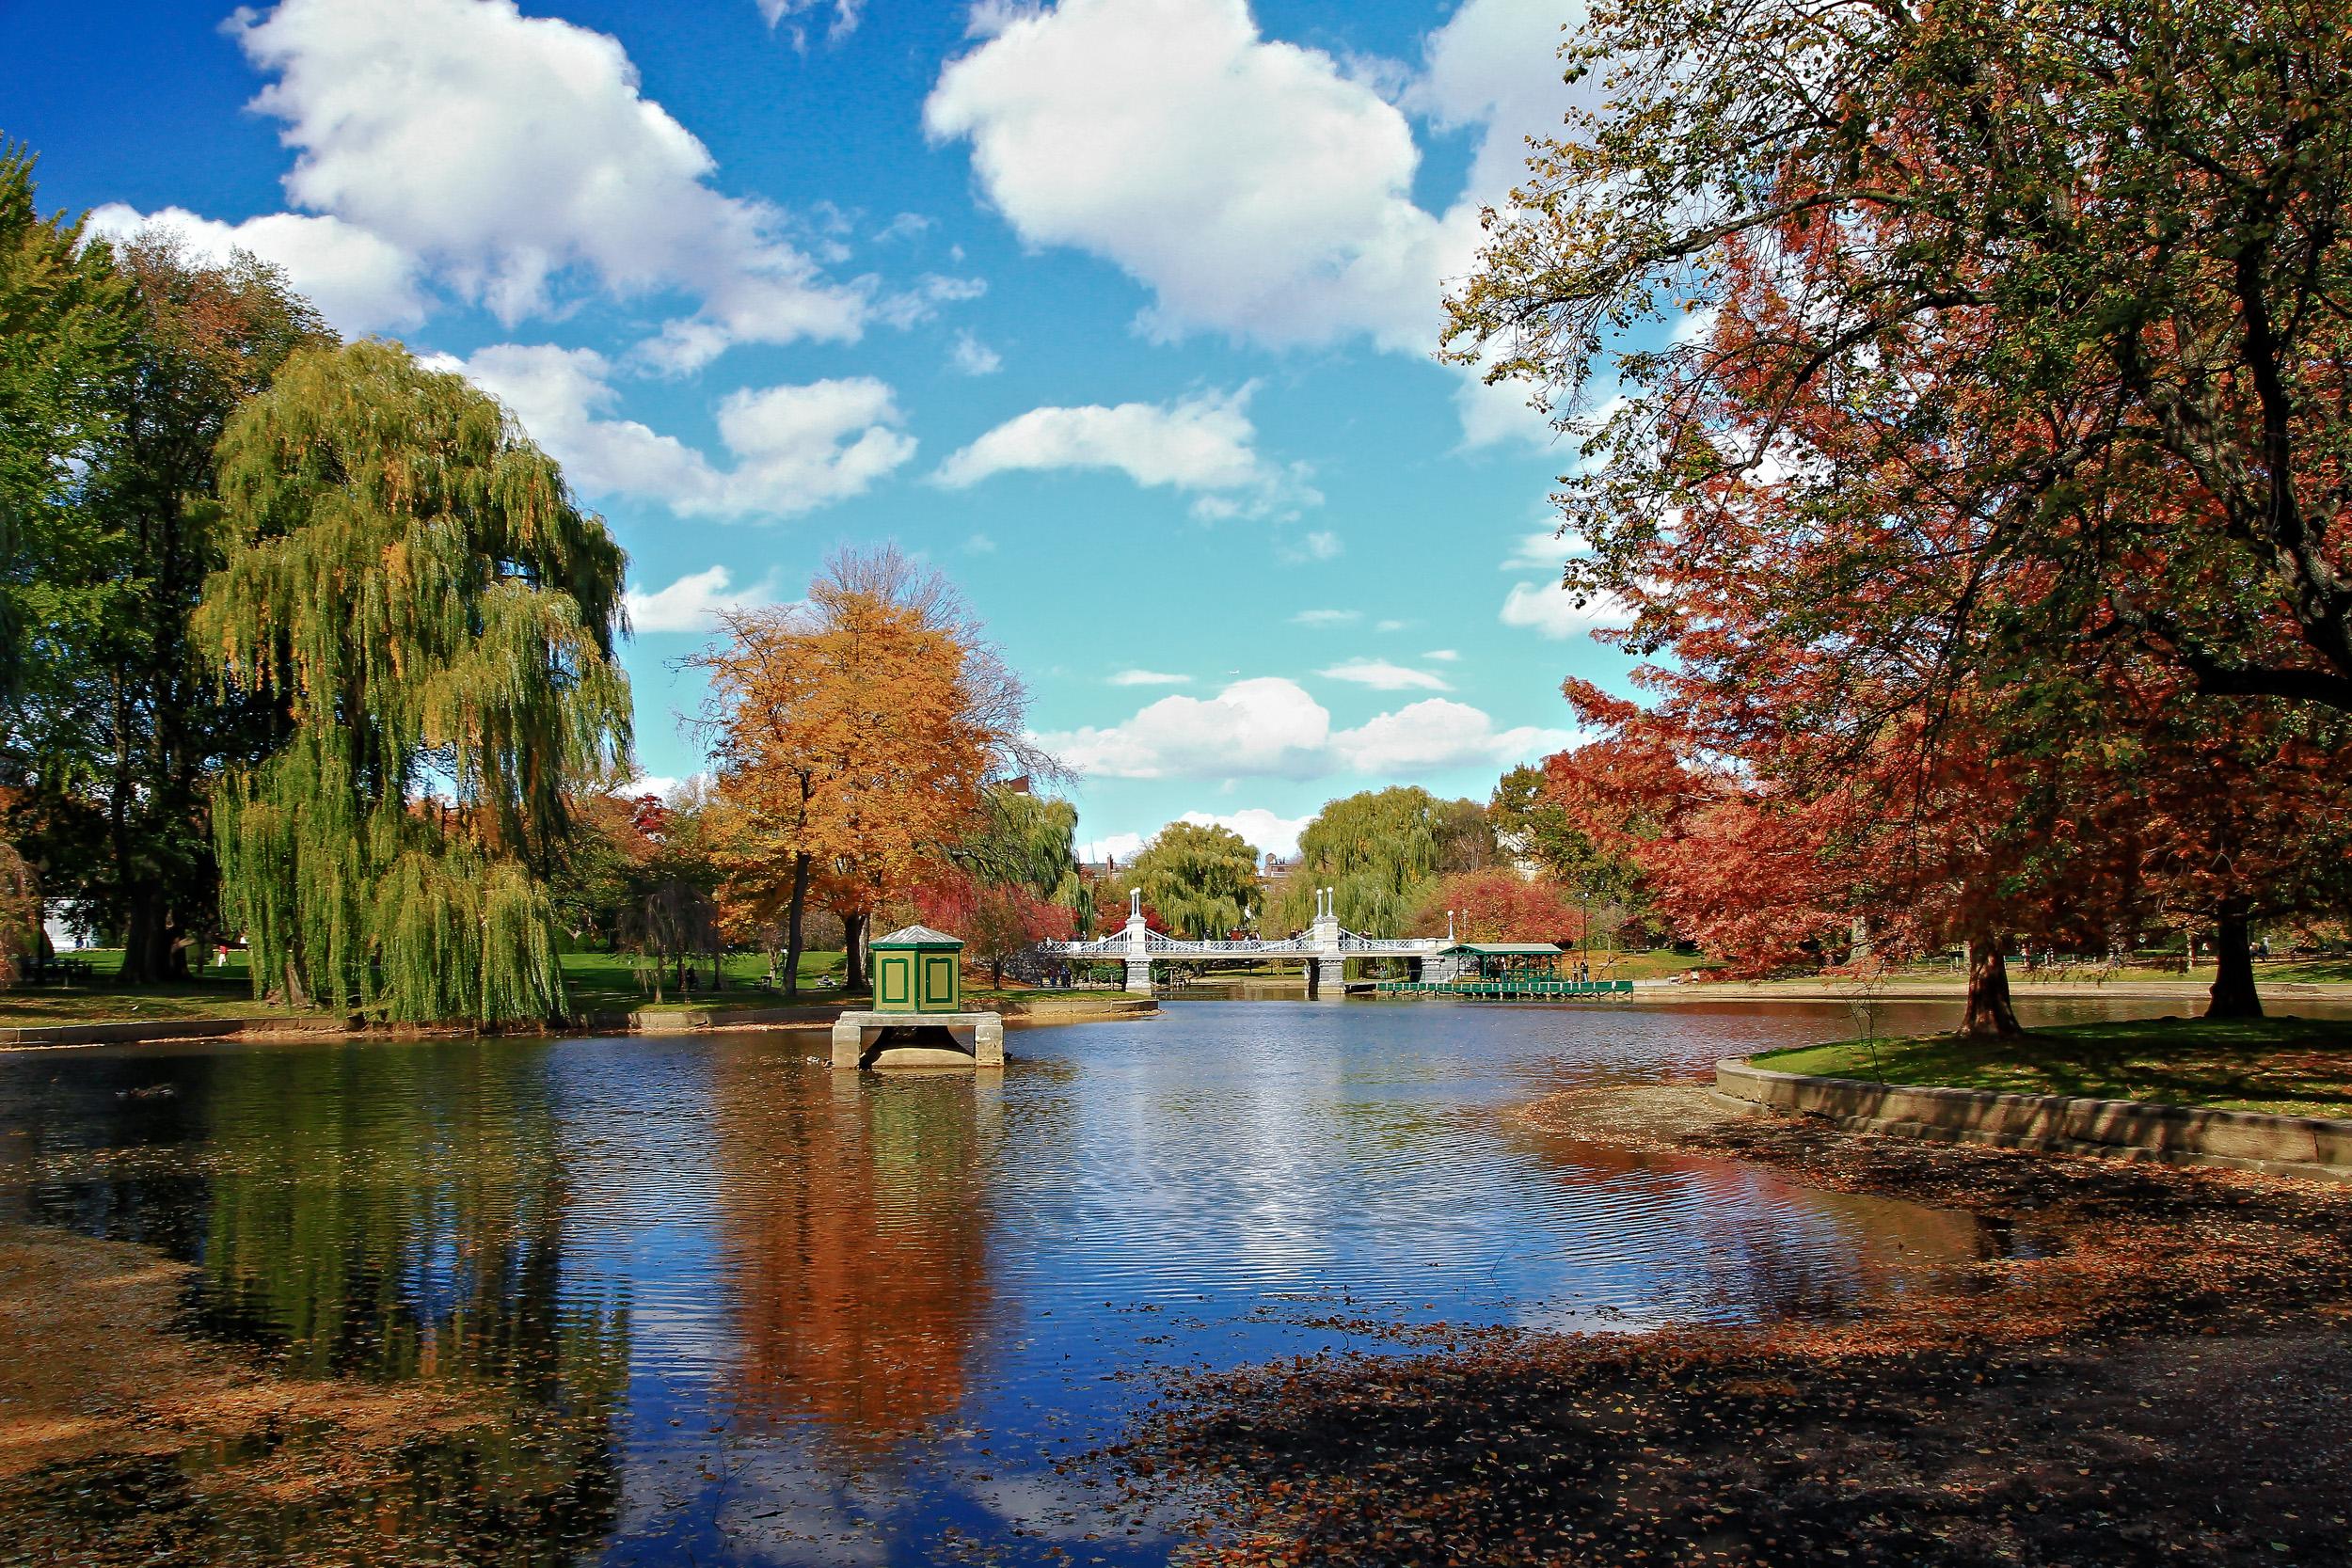 Boston_Garden_Miami_Fort_Lauderdale_commercial_photographer_Franklin_Castillo.jpg